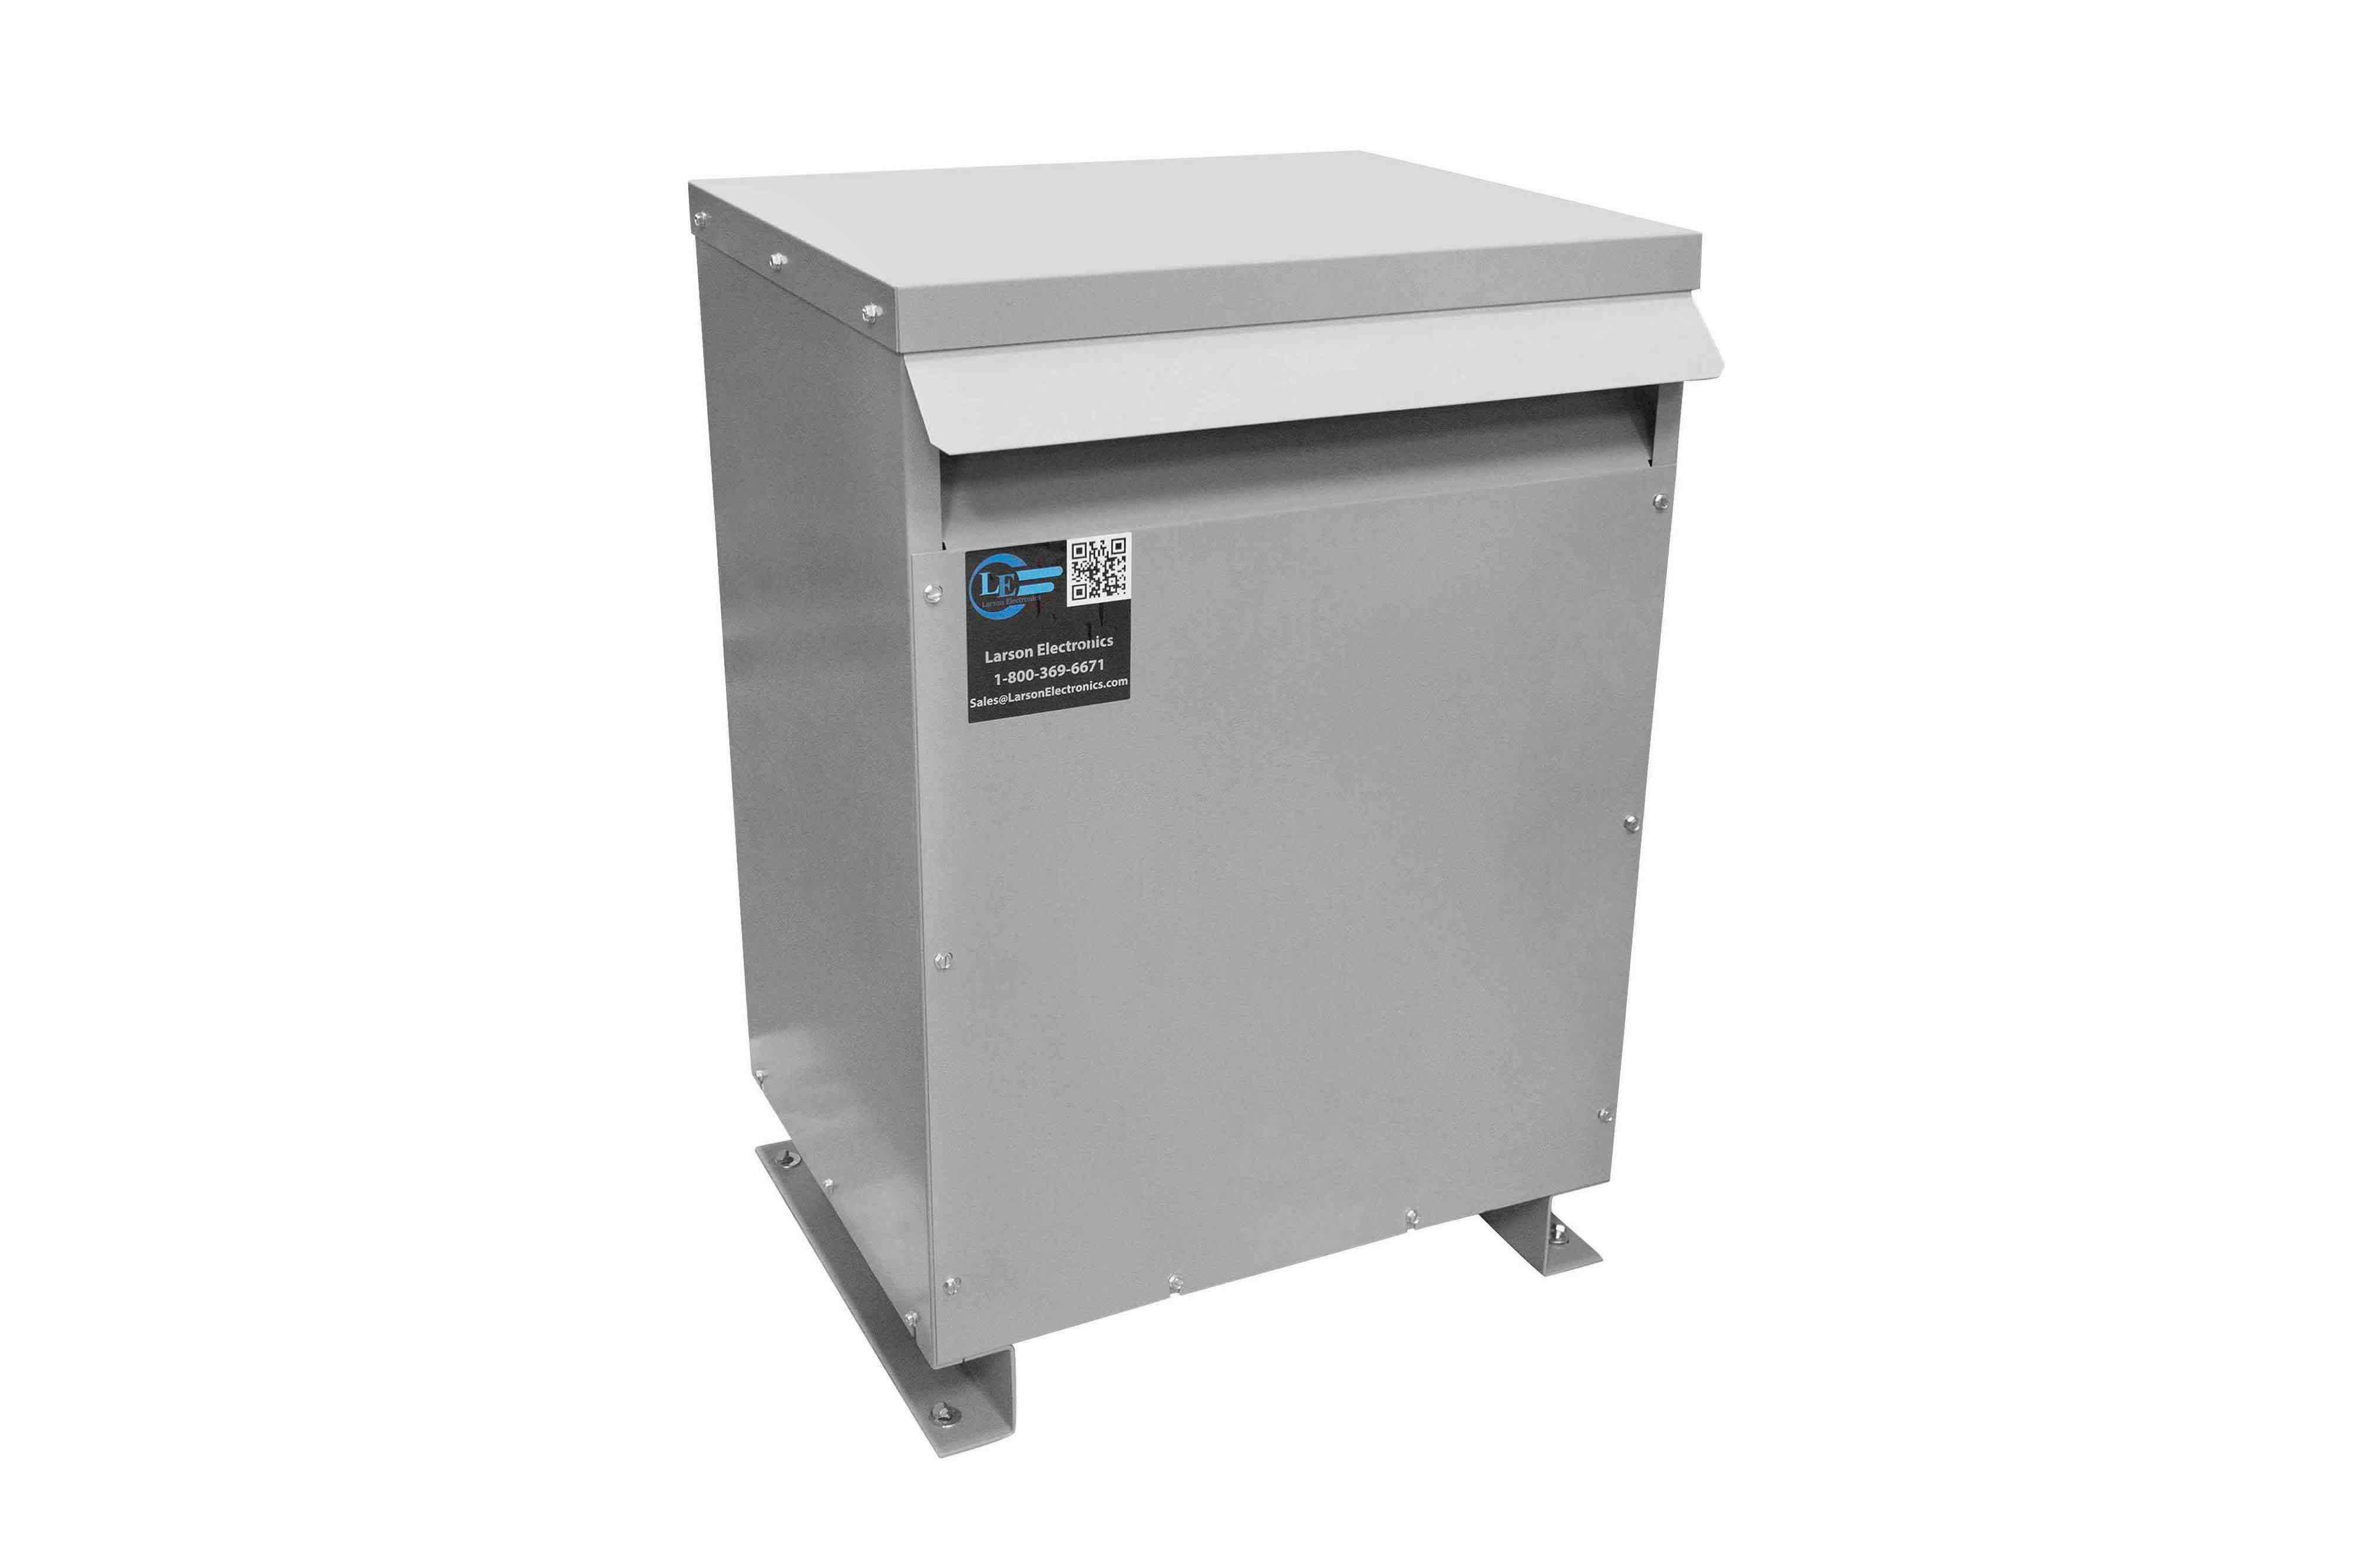 100 kVA 3PH Isolation Transformer, 575V Wye Primary, 400V Delta Secondary, N3R, Ventilated, 60 Hz